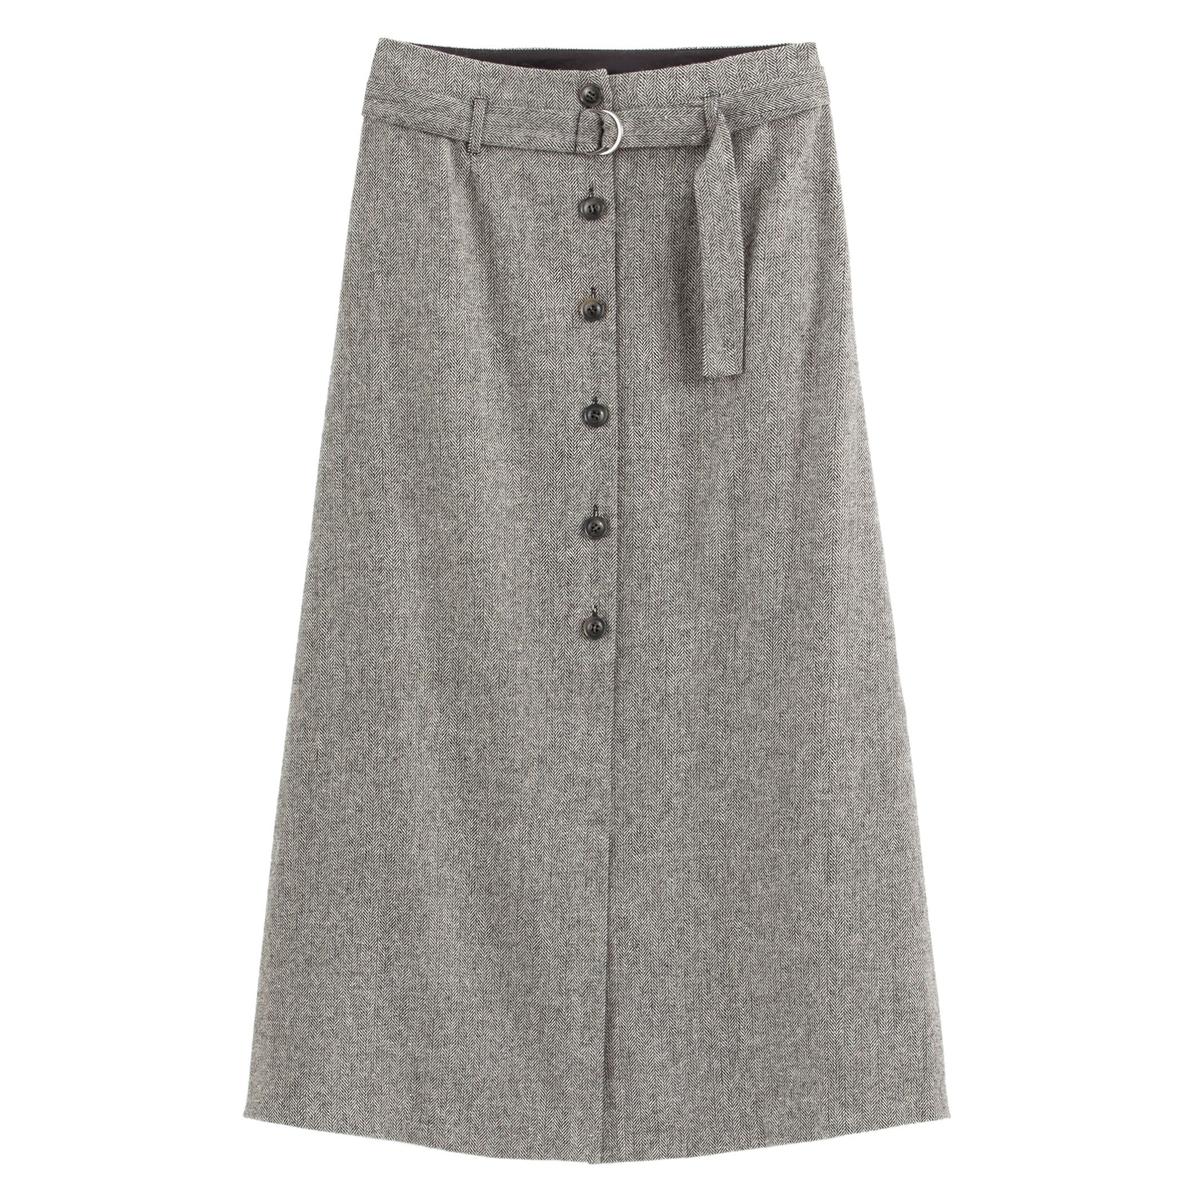 Falda larga de tweed con espiga